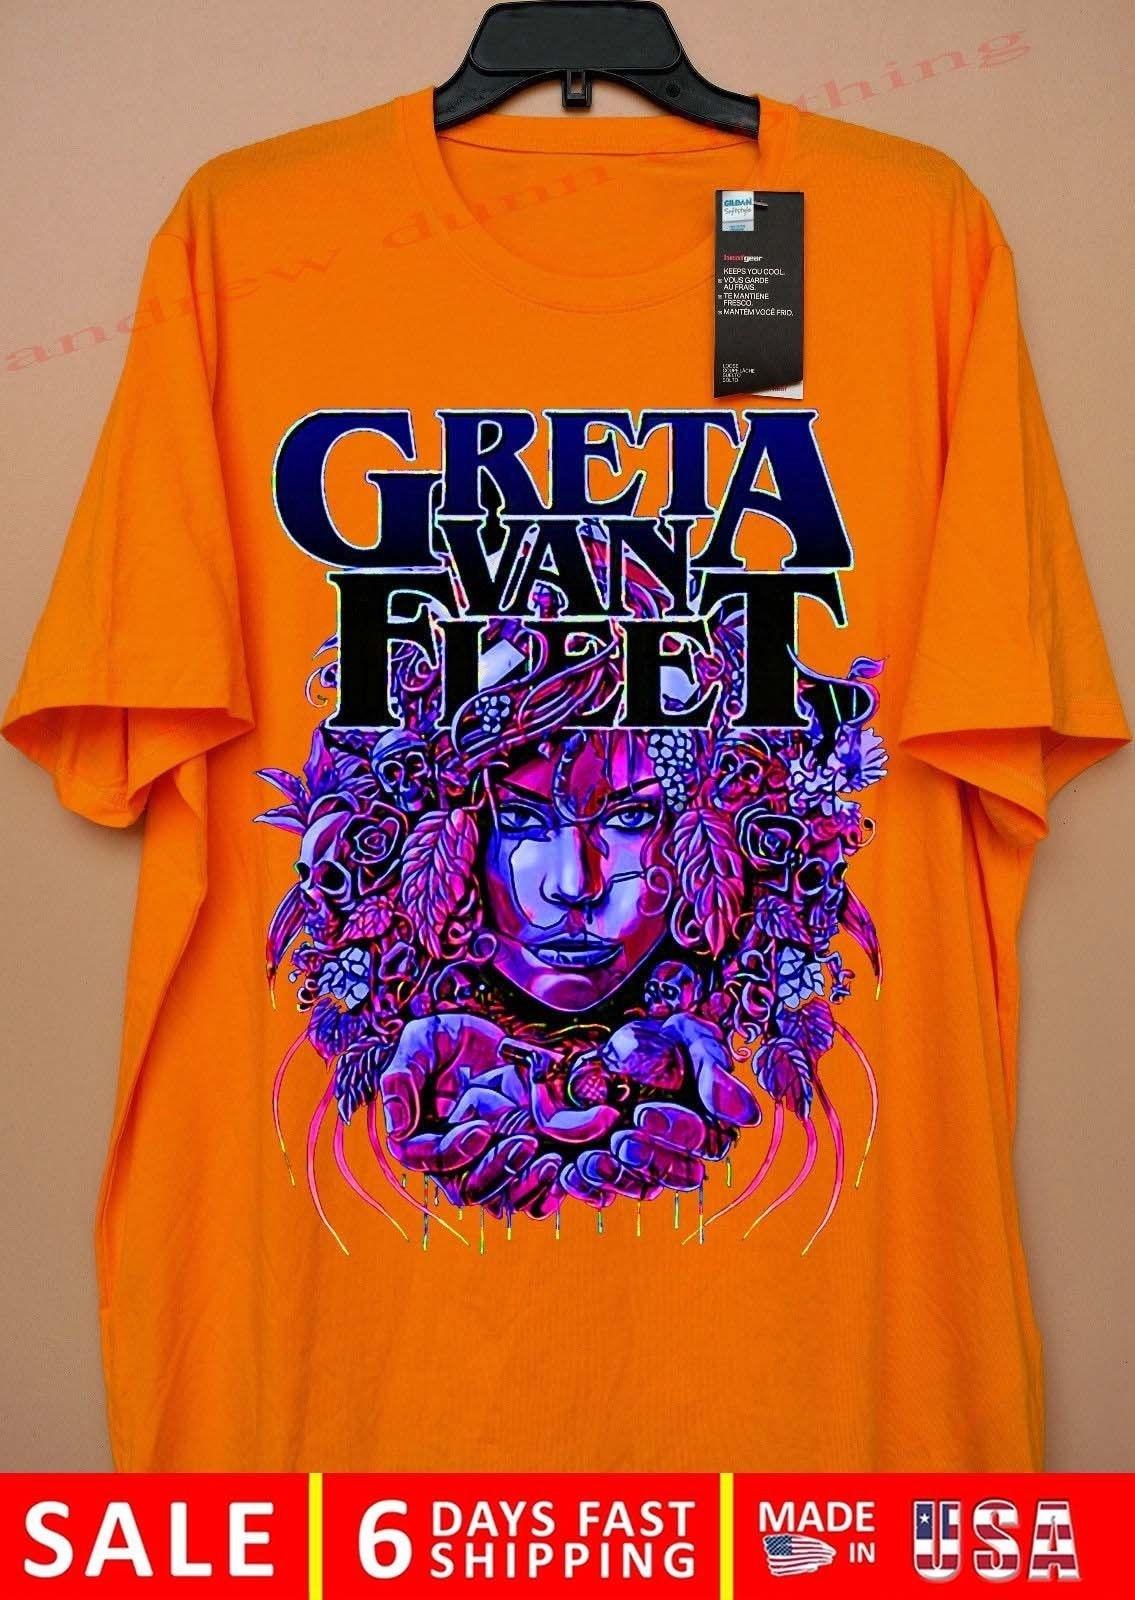 987b7003c4ea Aliexpress.com : Buy GRETA VAN FLEET TOUR DATES 2018 T Shirt from Reliable  T-Shirts suppliers on GONGNIU Store